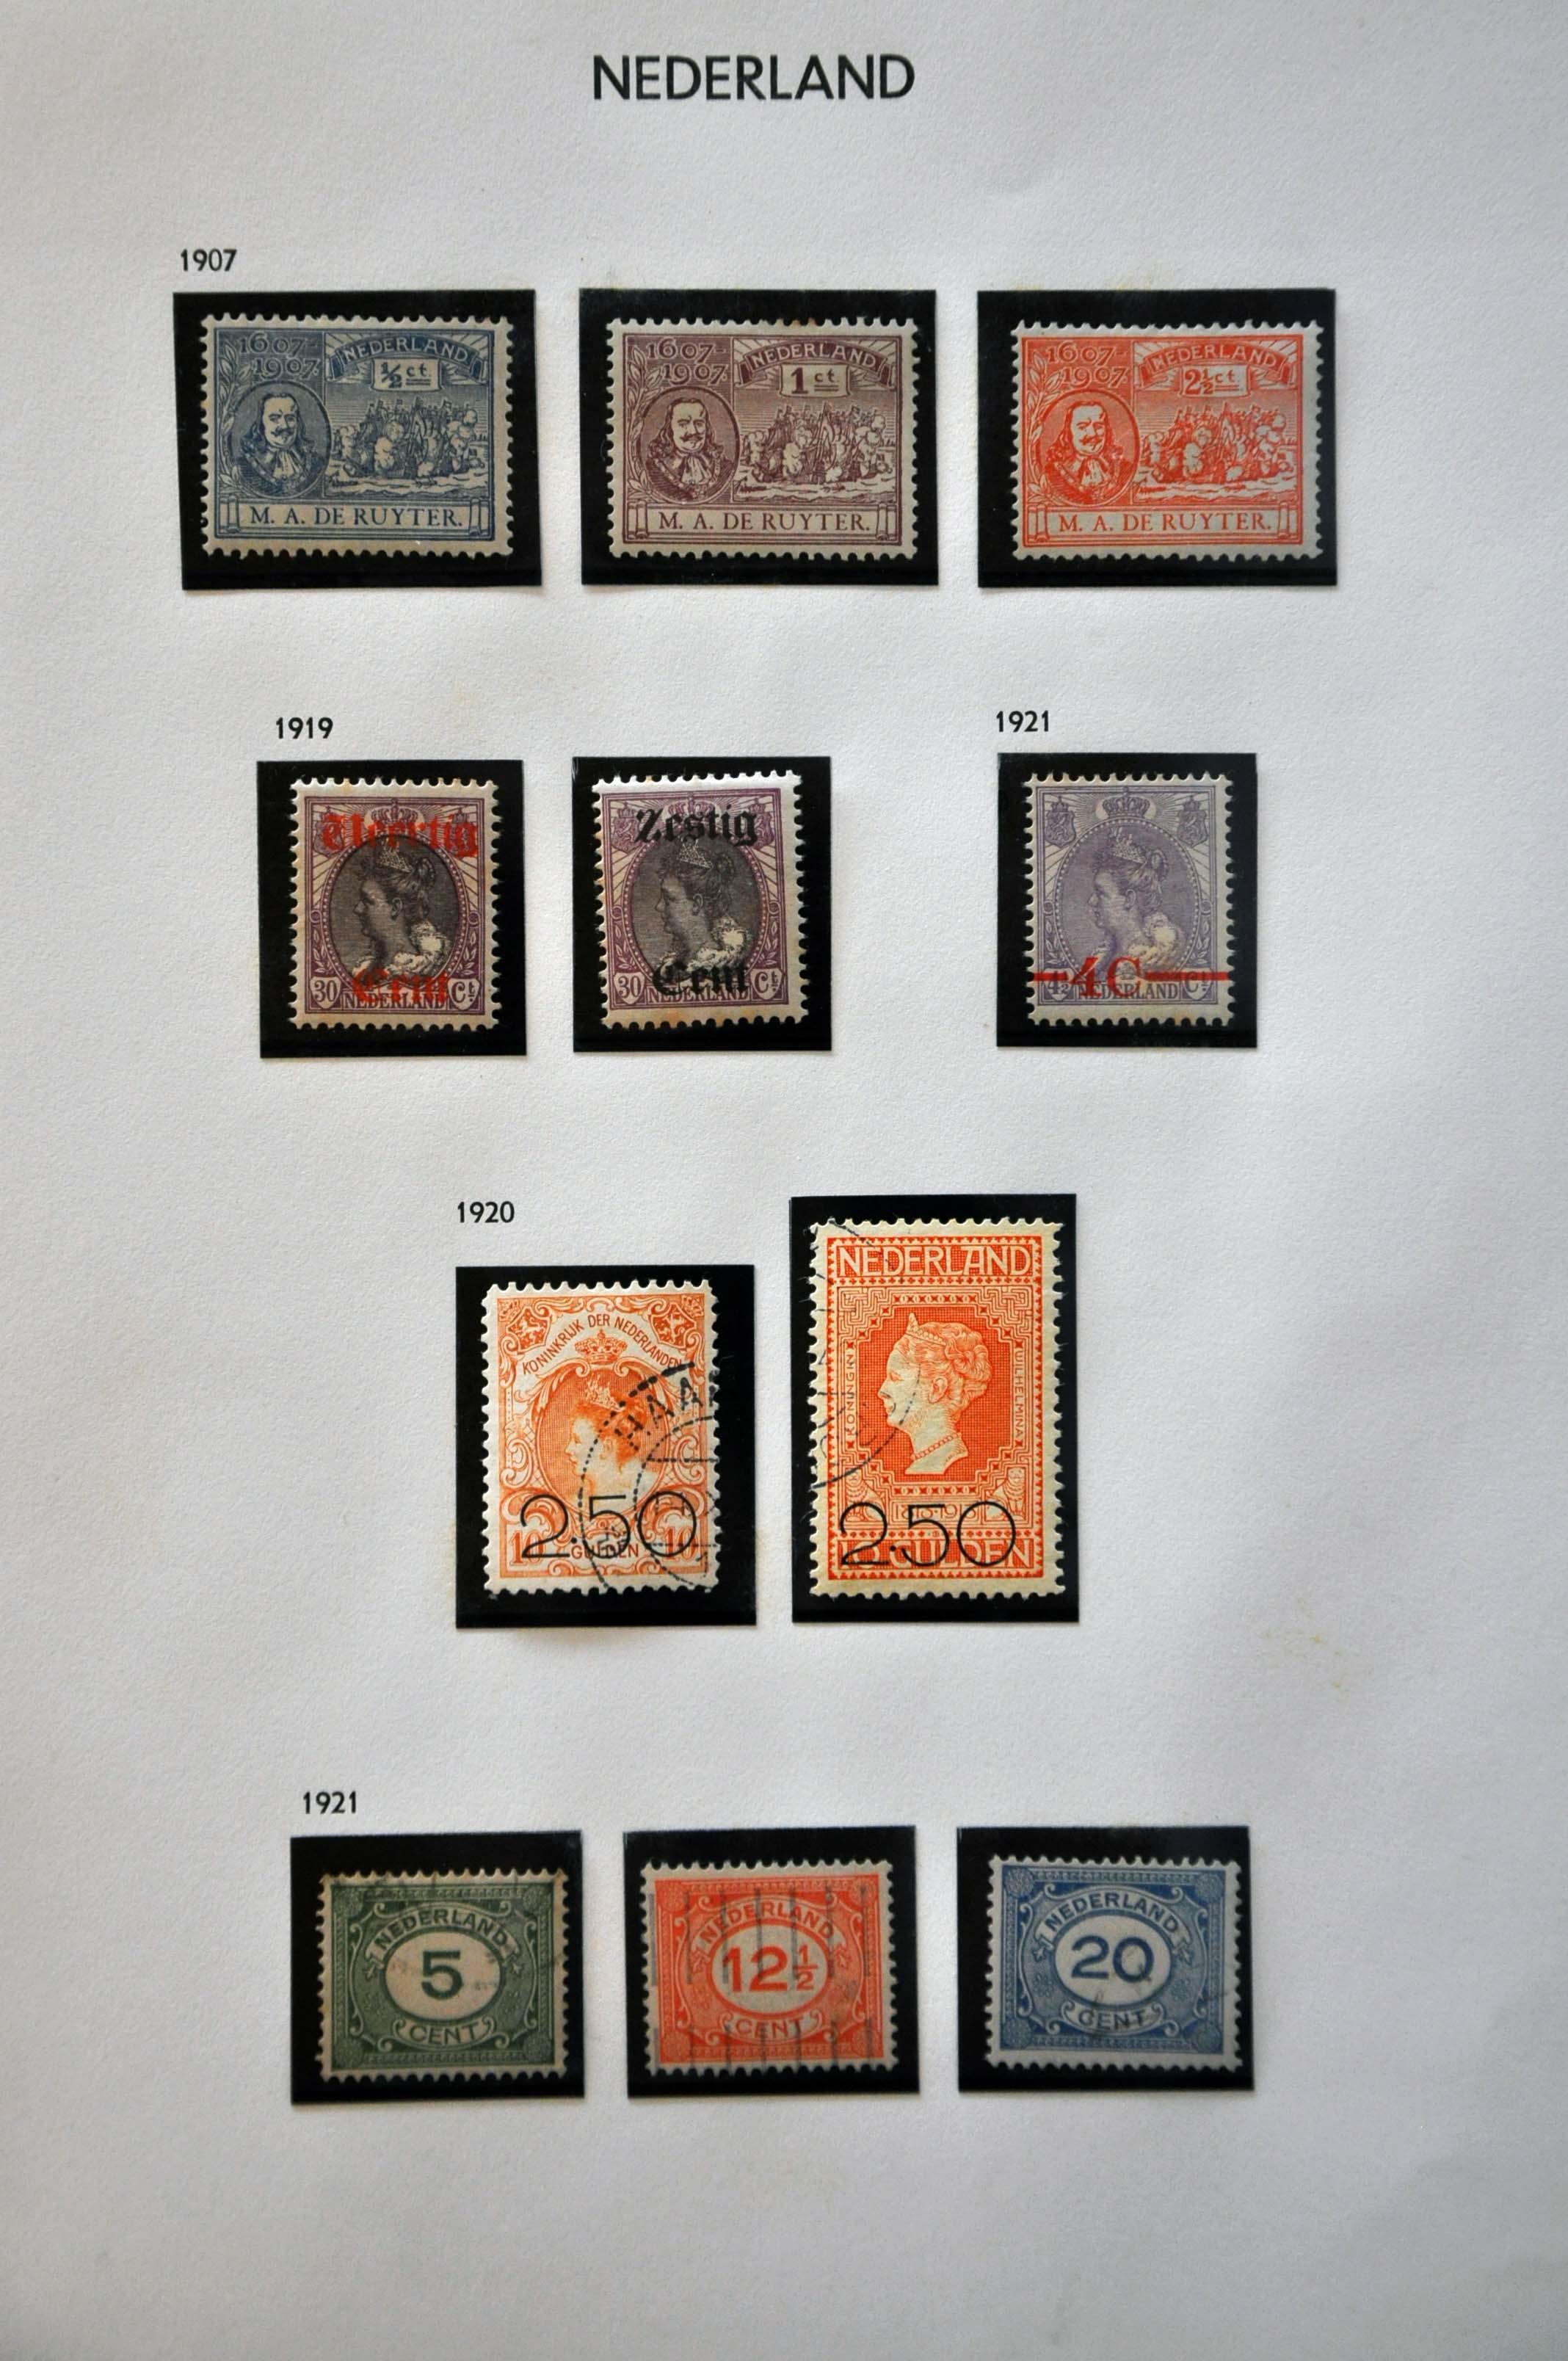 Lot 1495 - Netherlands and former colonies Netherlands -  Corinphila Veilingen Auction 239: General sale